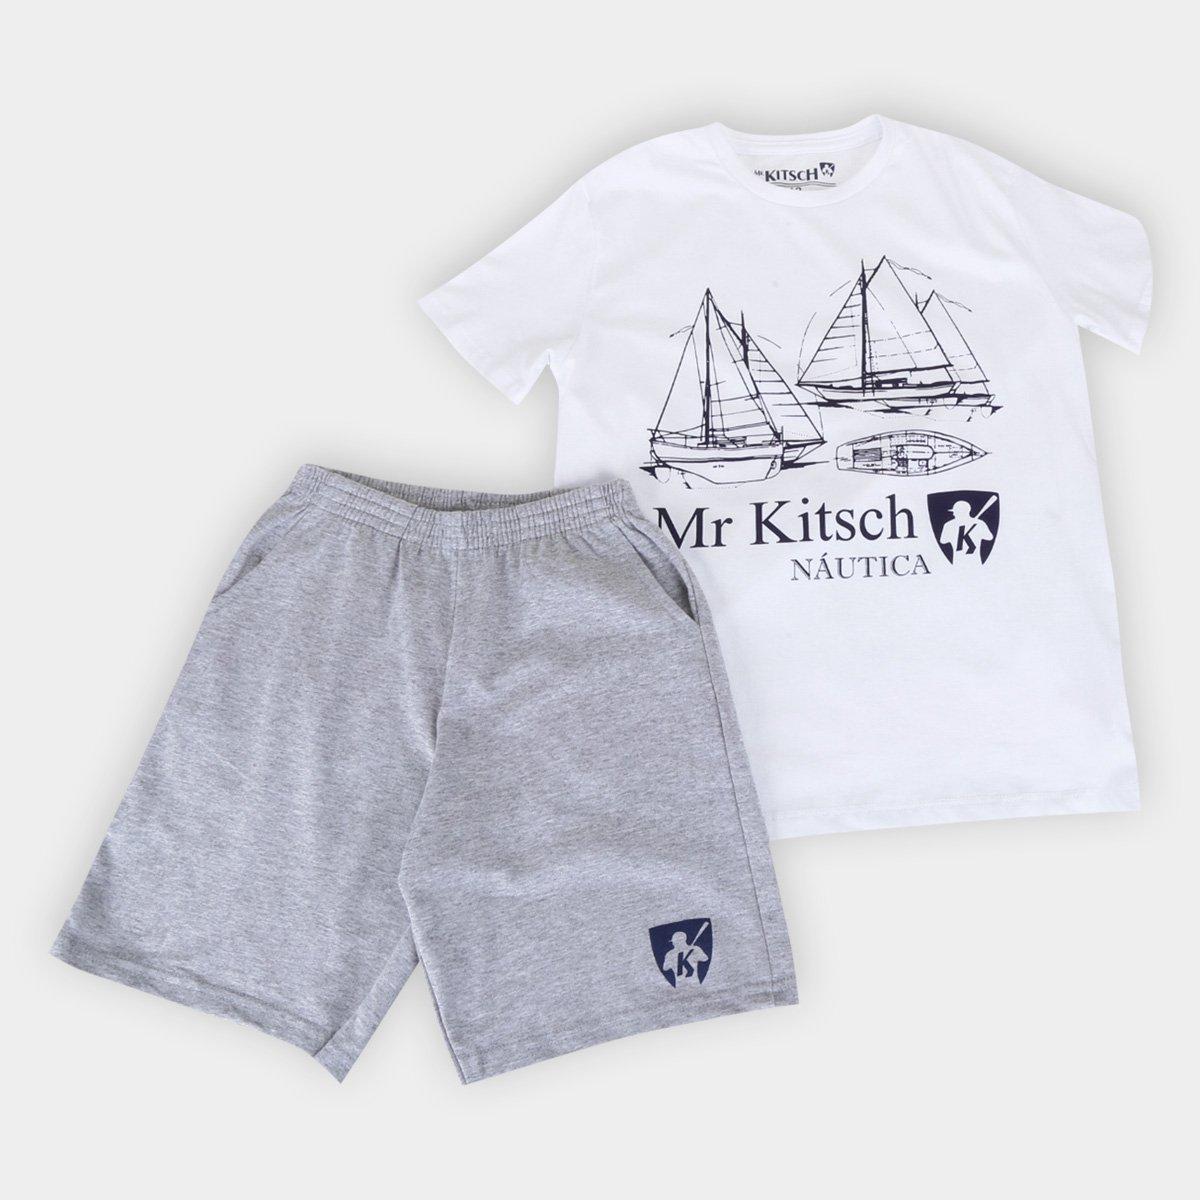 Conjunto Juvenil MR. Kitsch Náutica Camiseta + Short Masculino